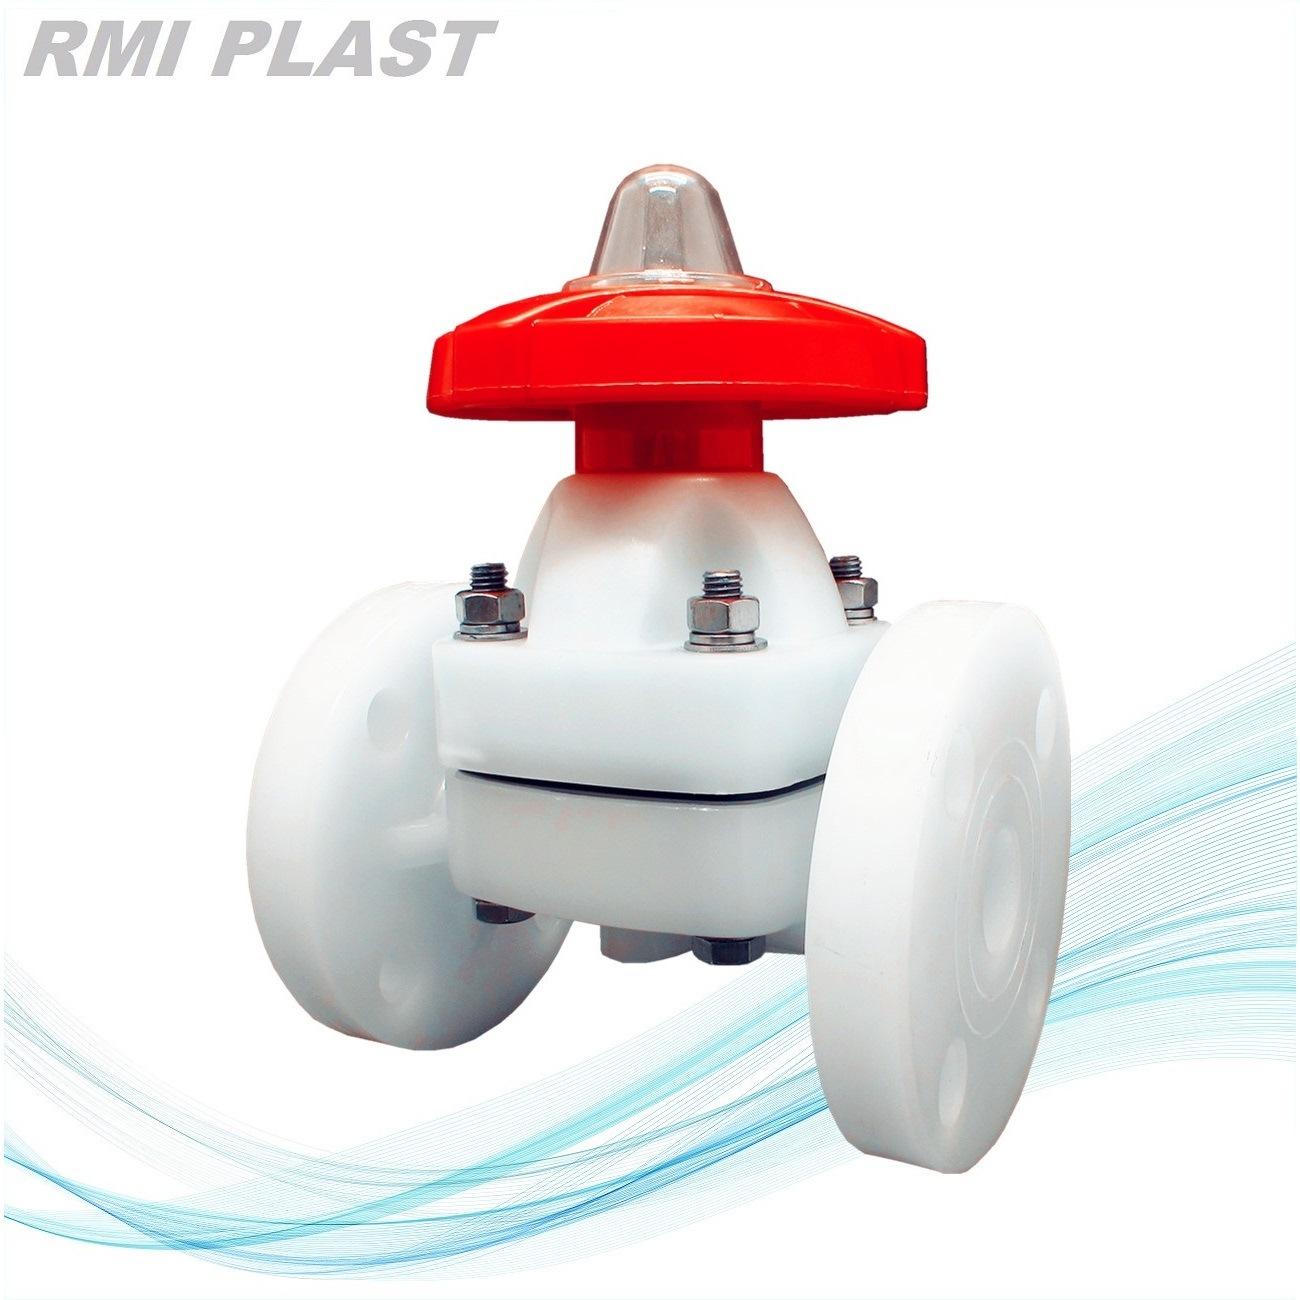 PVC CPVC PVDF PP Plastic Diaphragm Valve